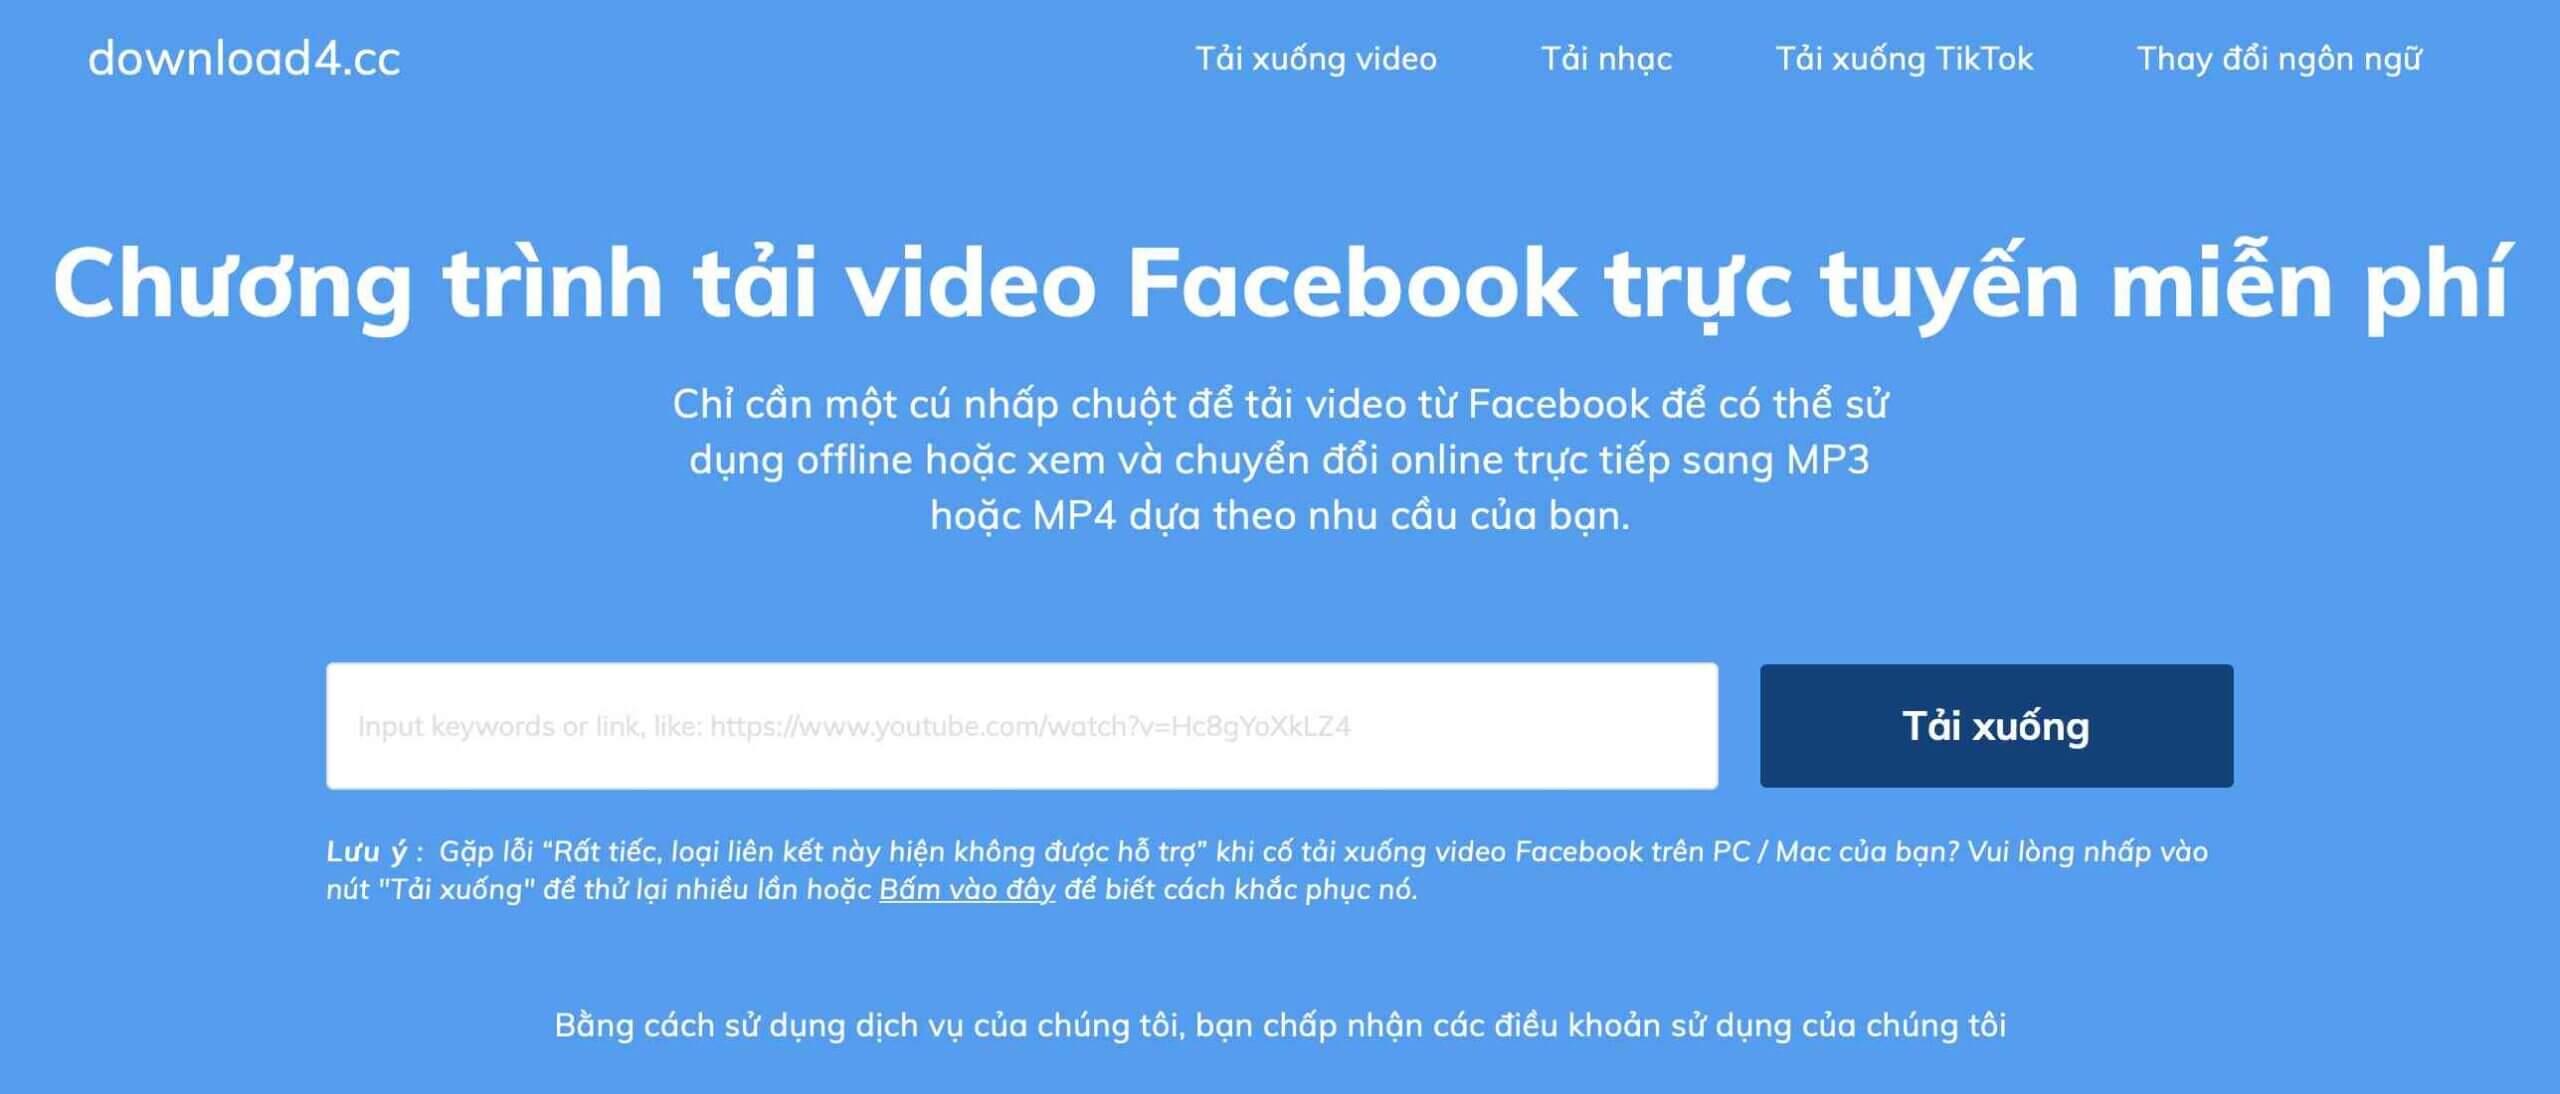 tai video online